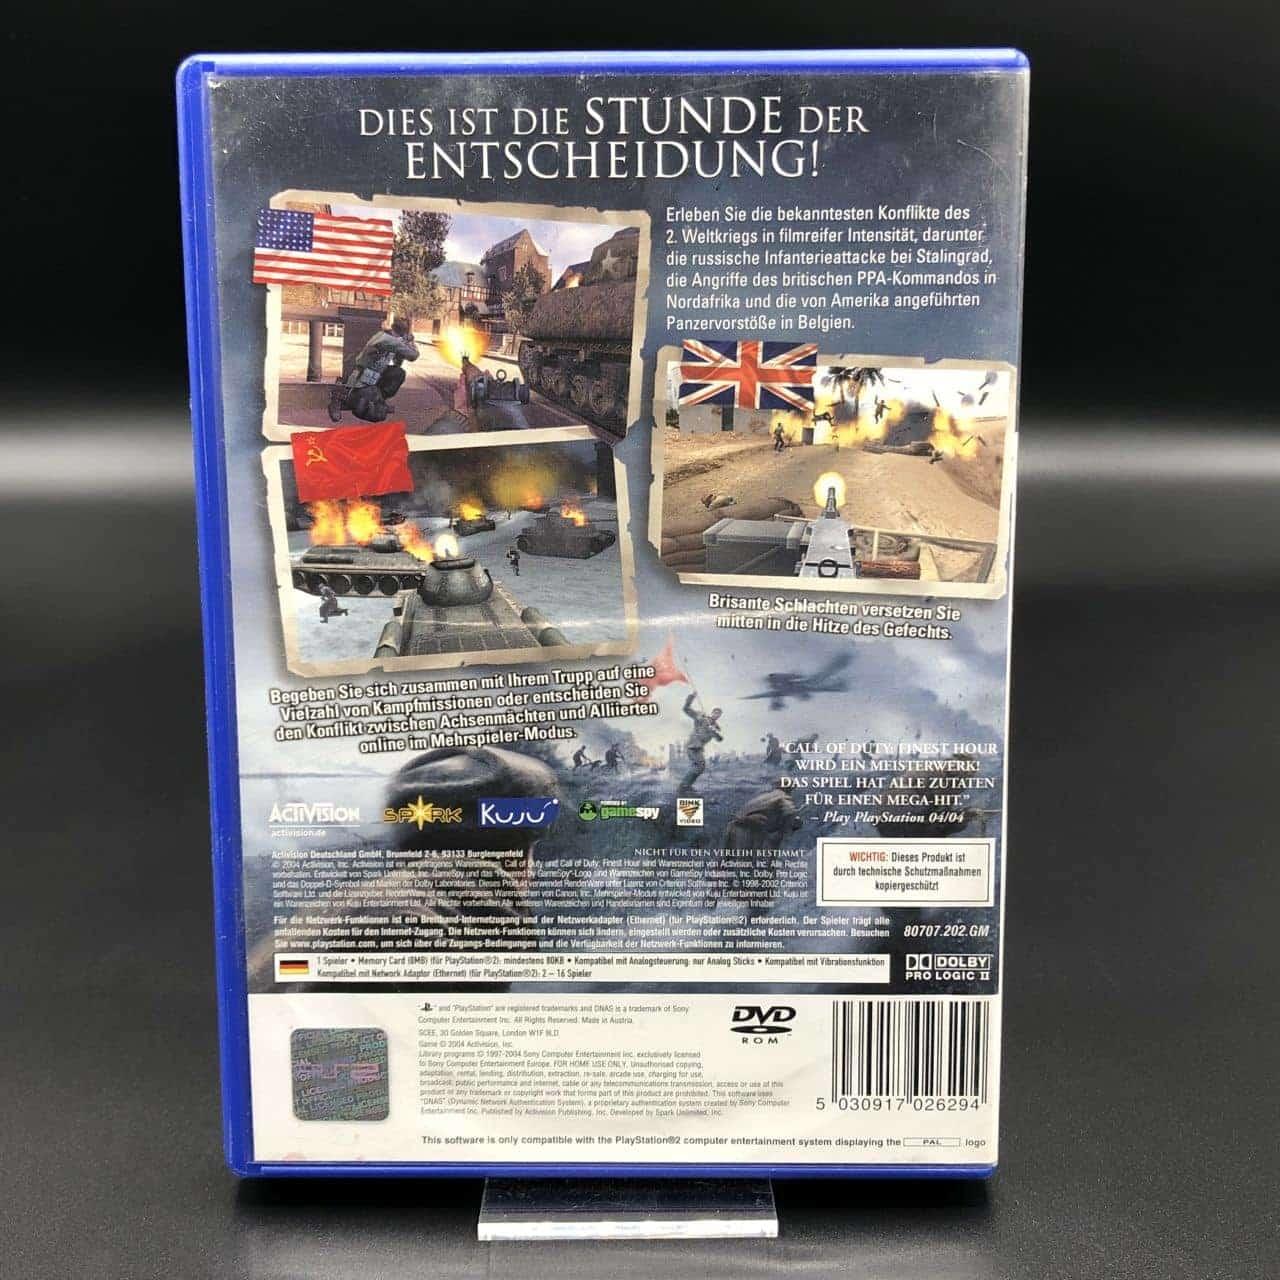 PS2 Call of Duty: Finest Hour (ohne Anleitung) (Gebrauchsspuren) Sony PlayStation 2 (FSK18)